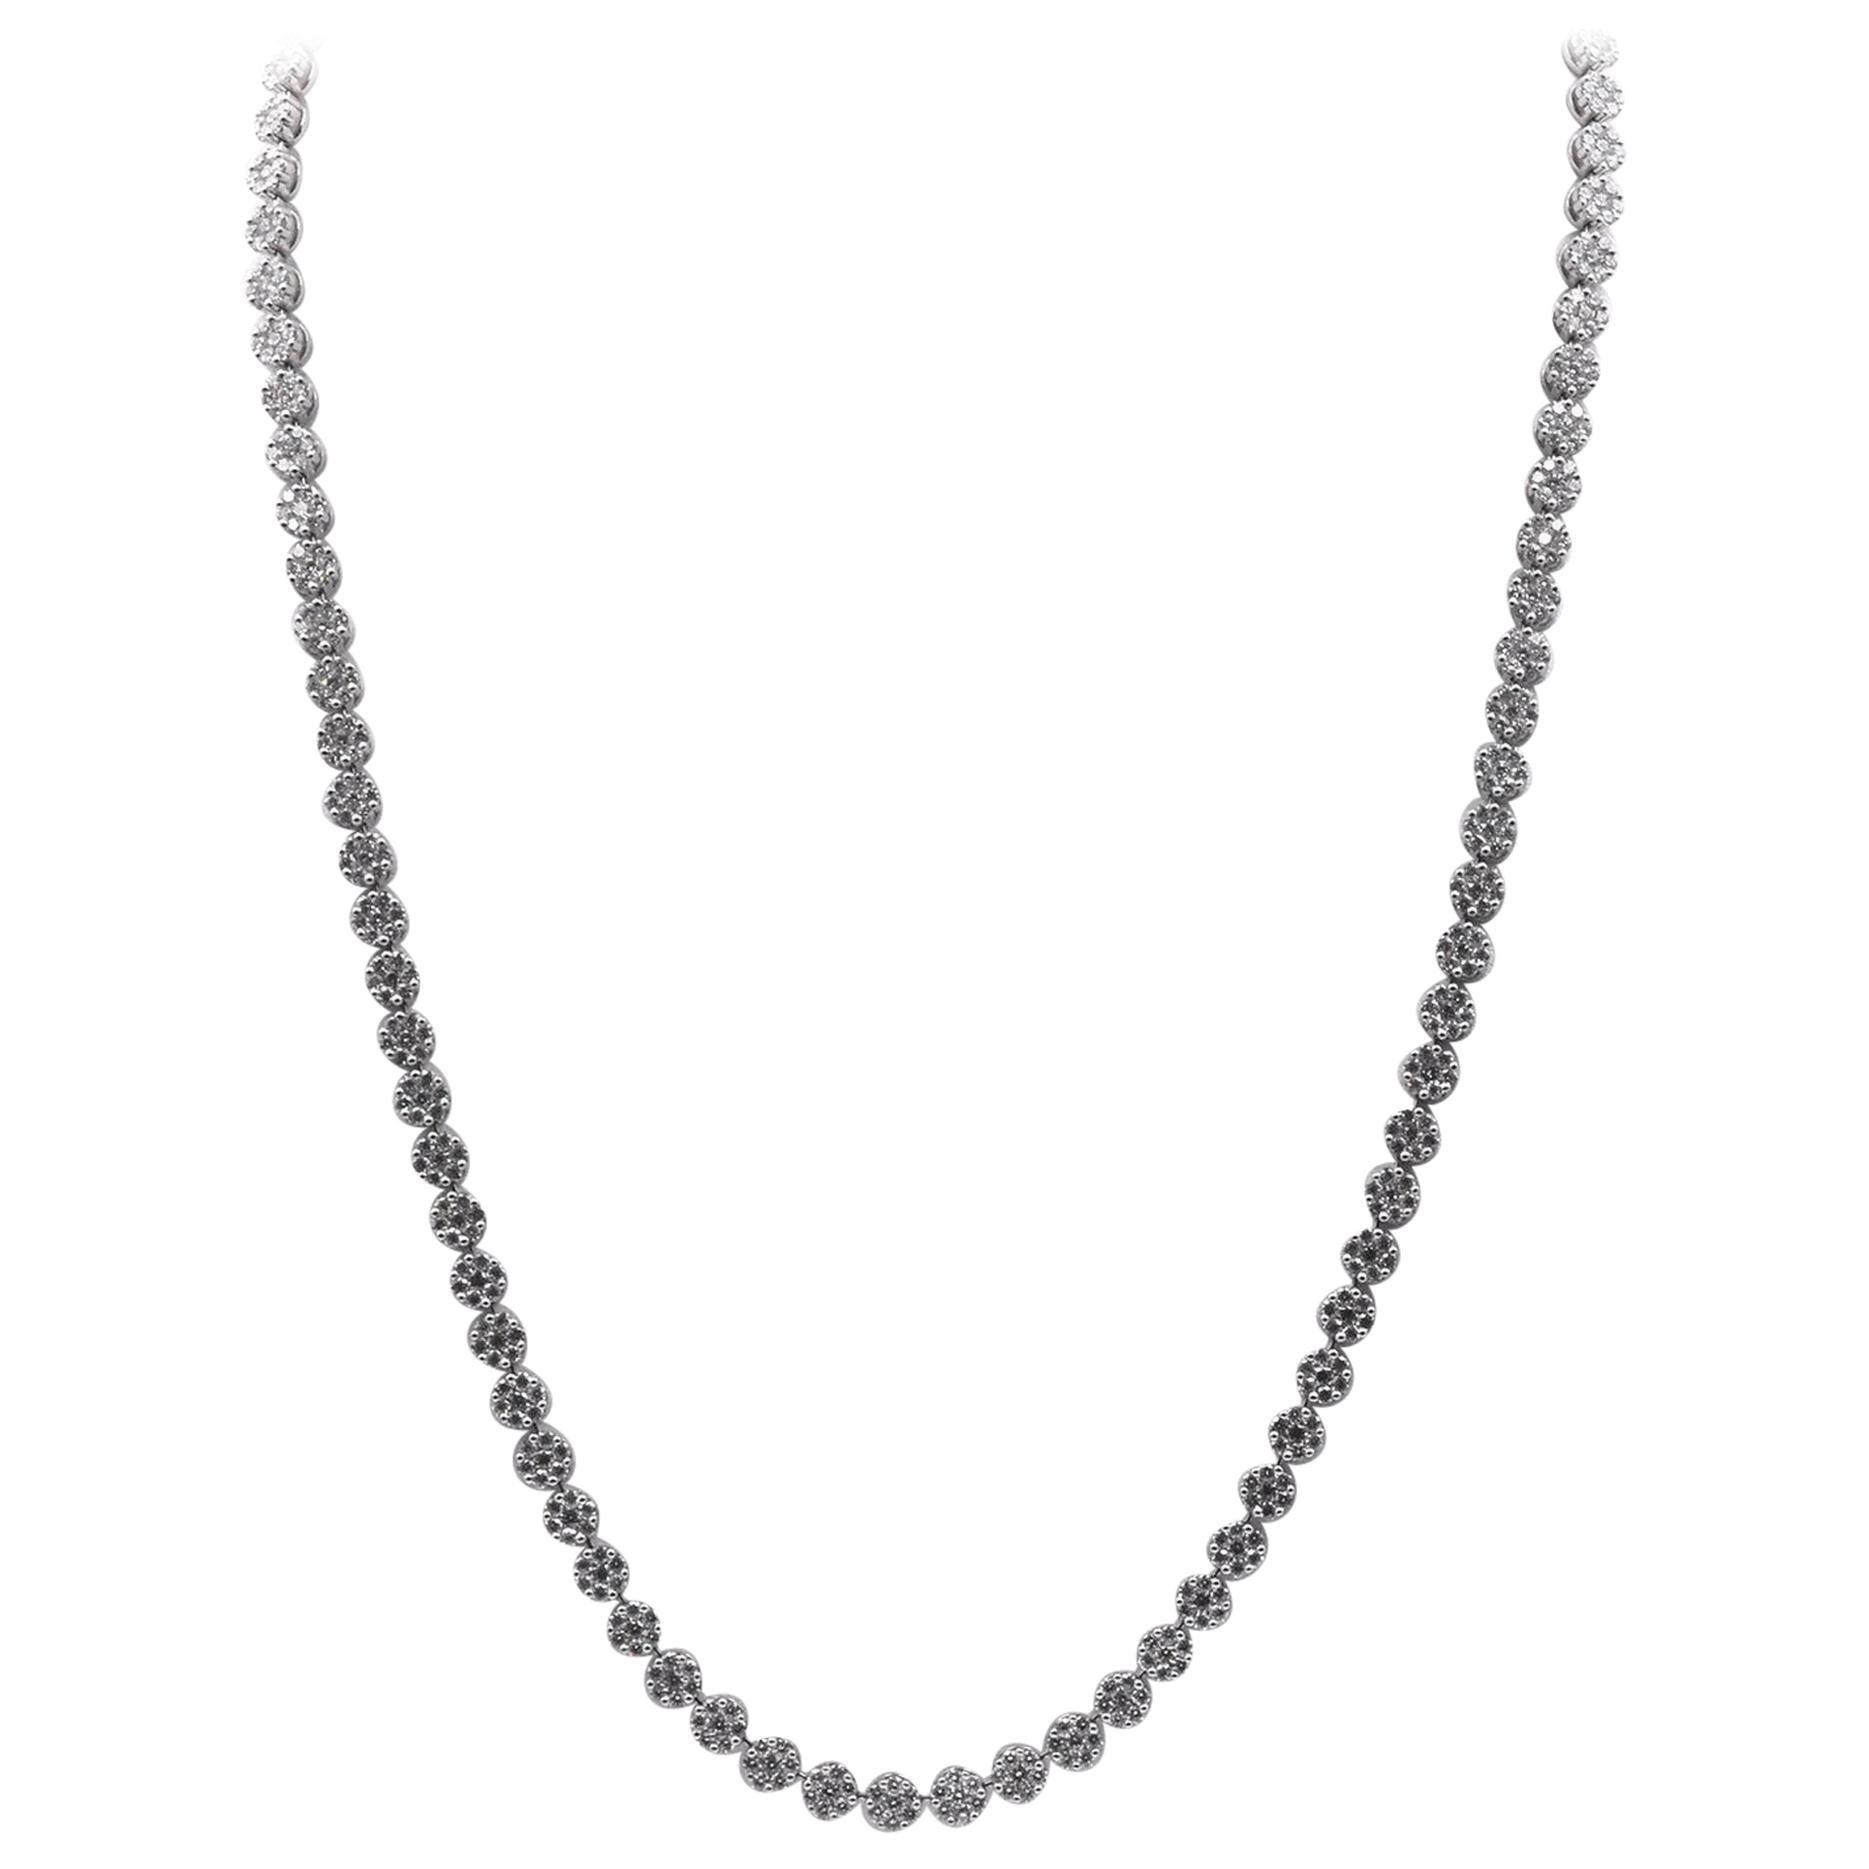 18 Karat White Gold Floral Diamond Cluster Necklace